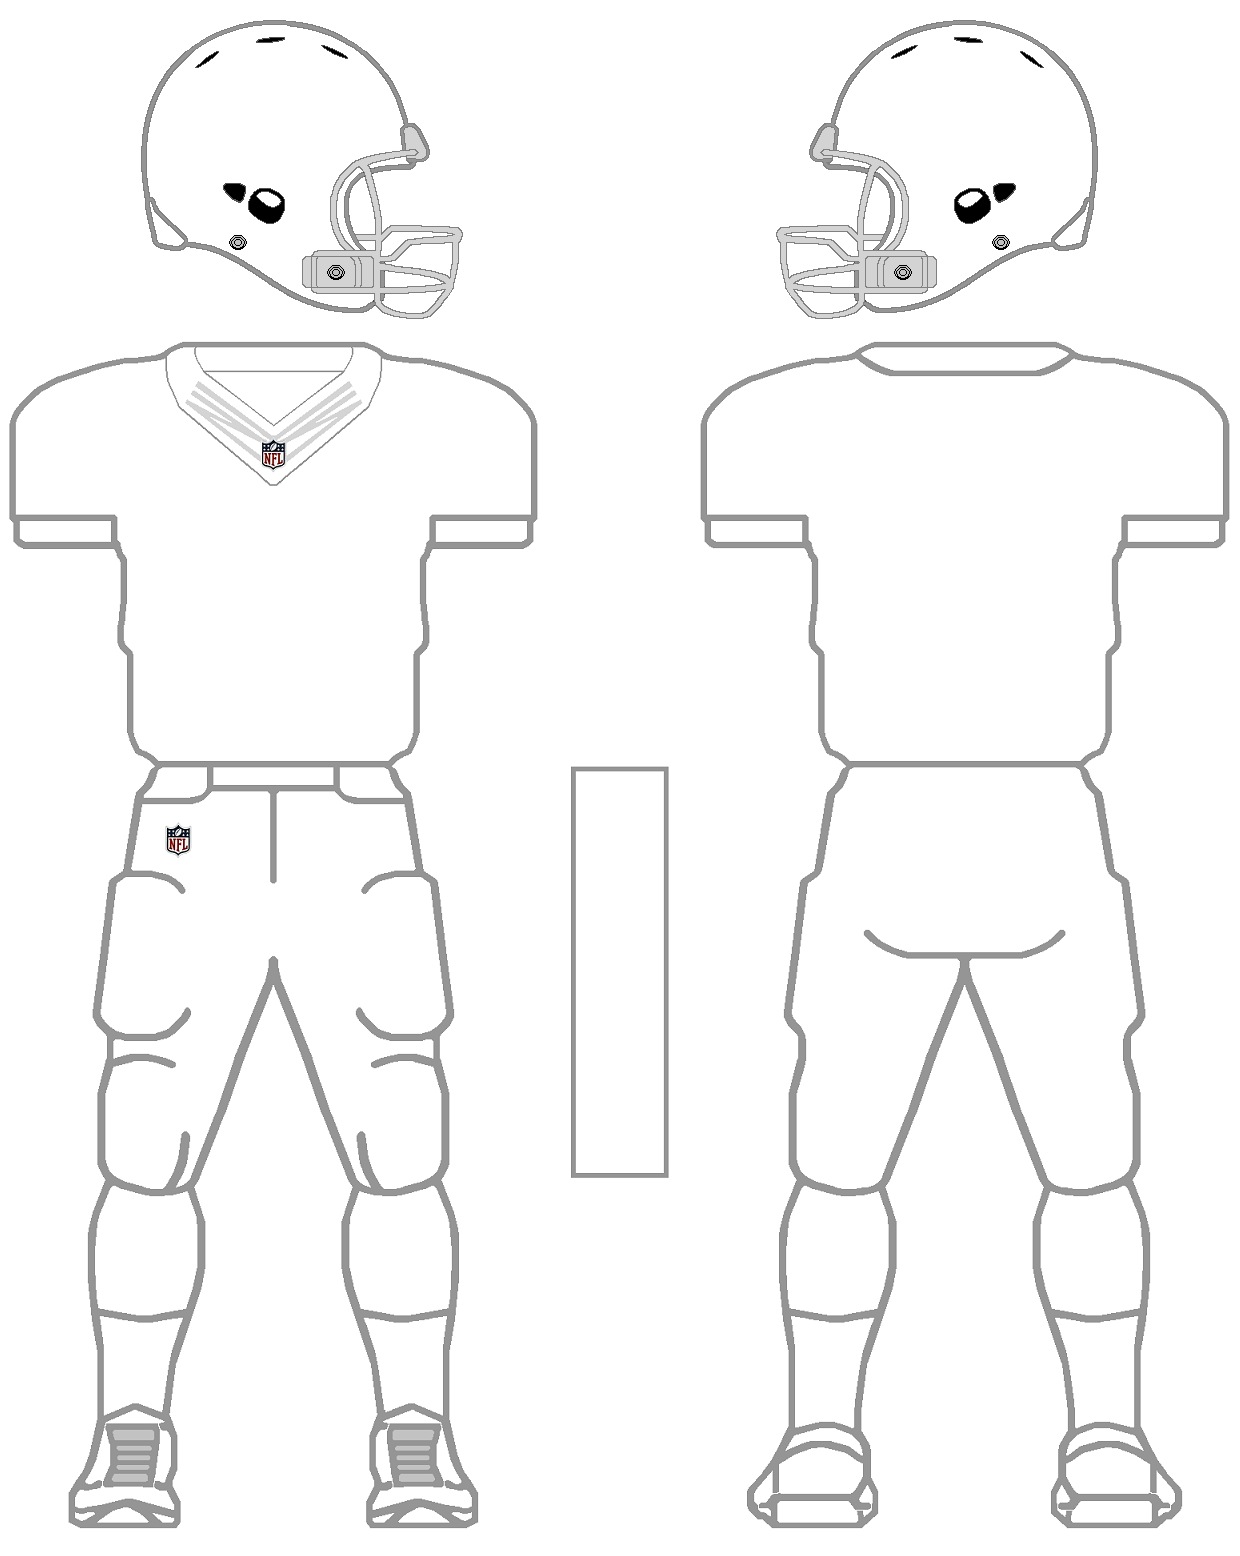 Footbal jersey design template